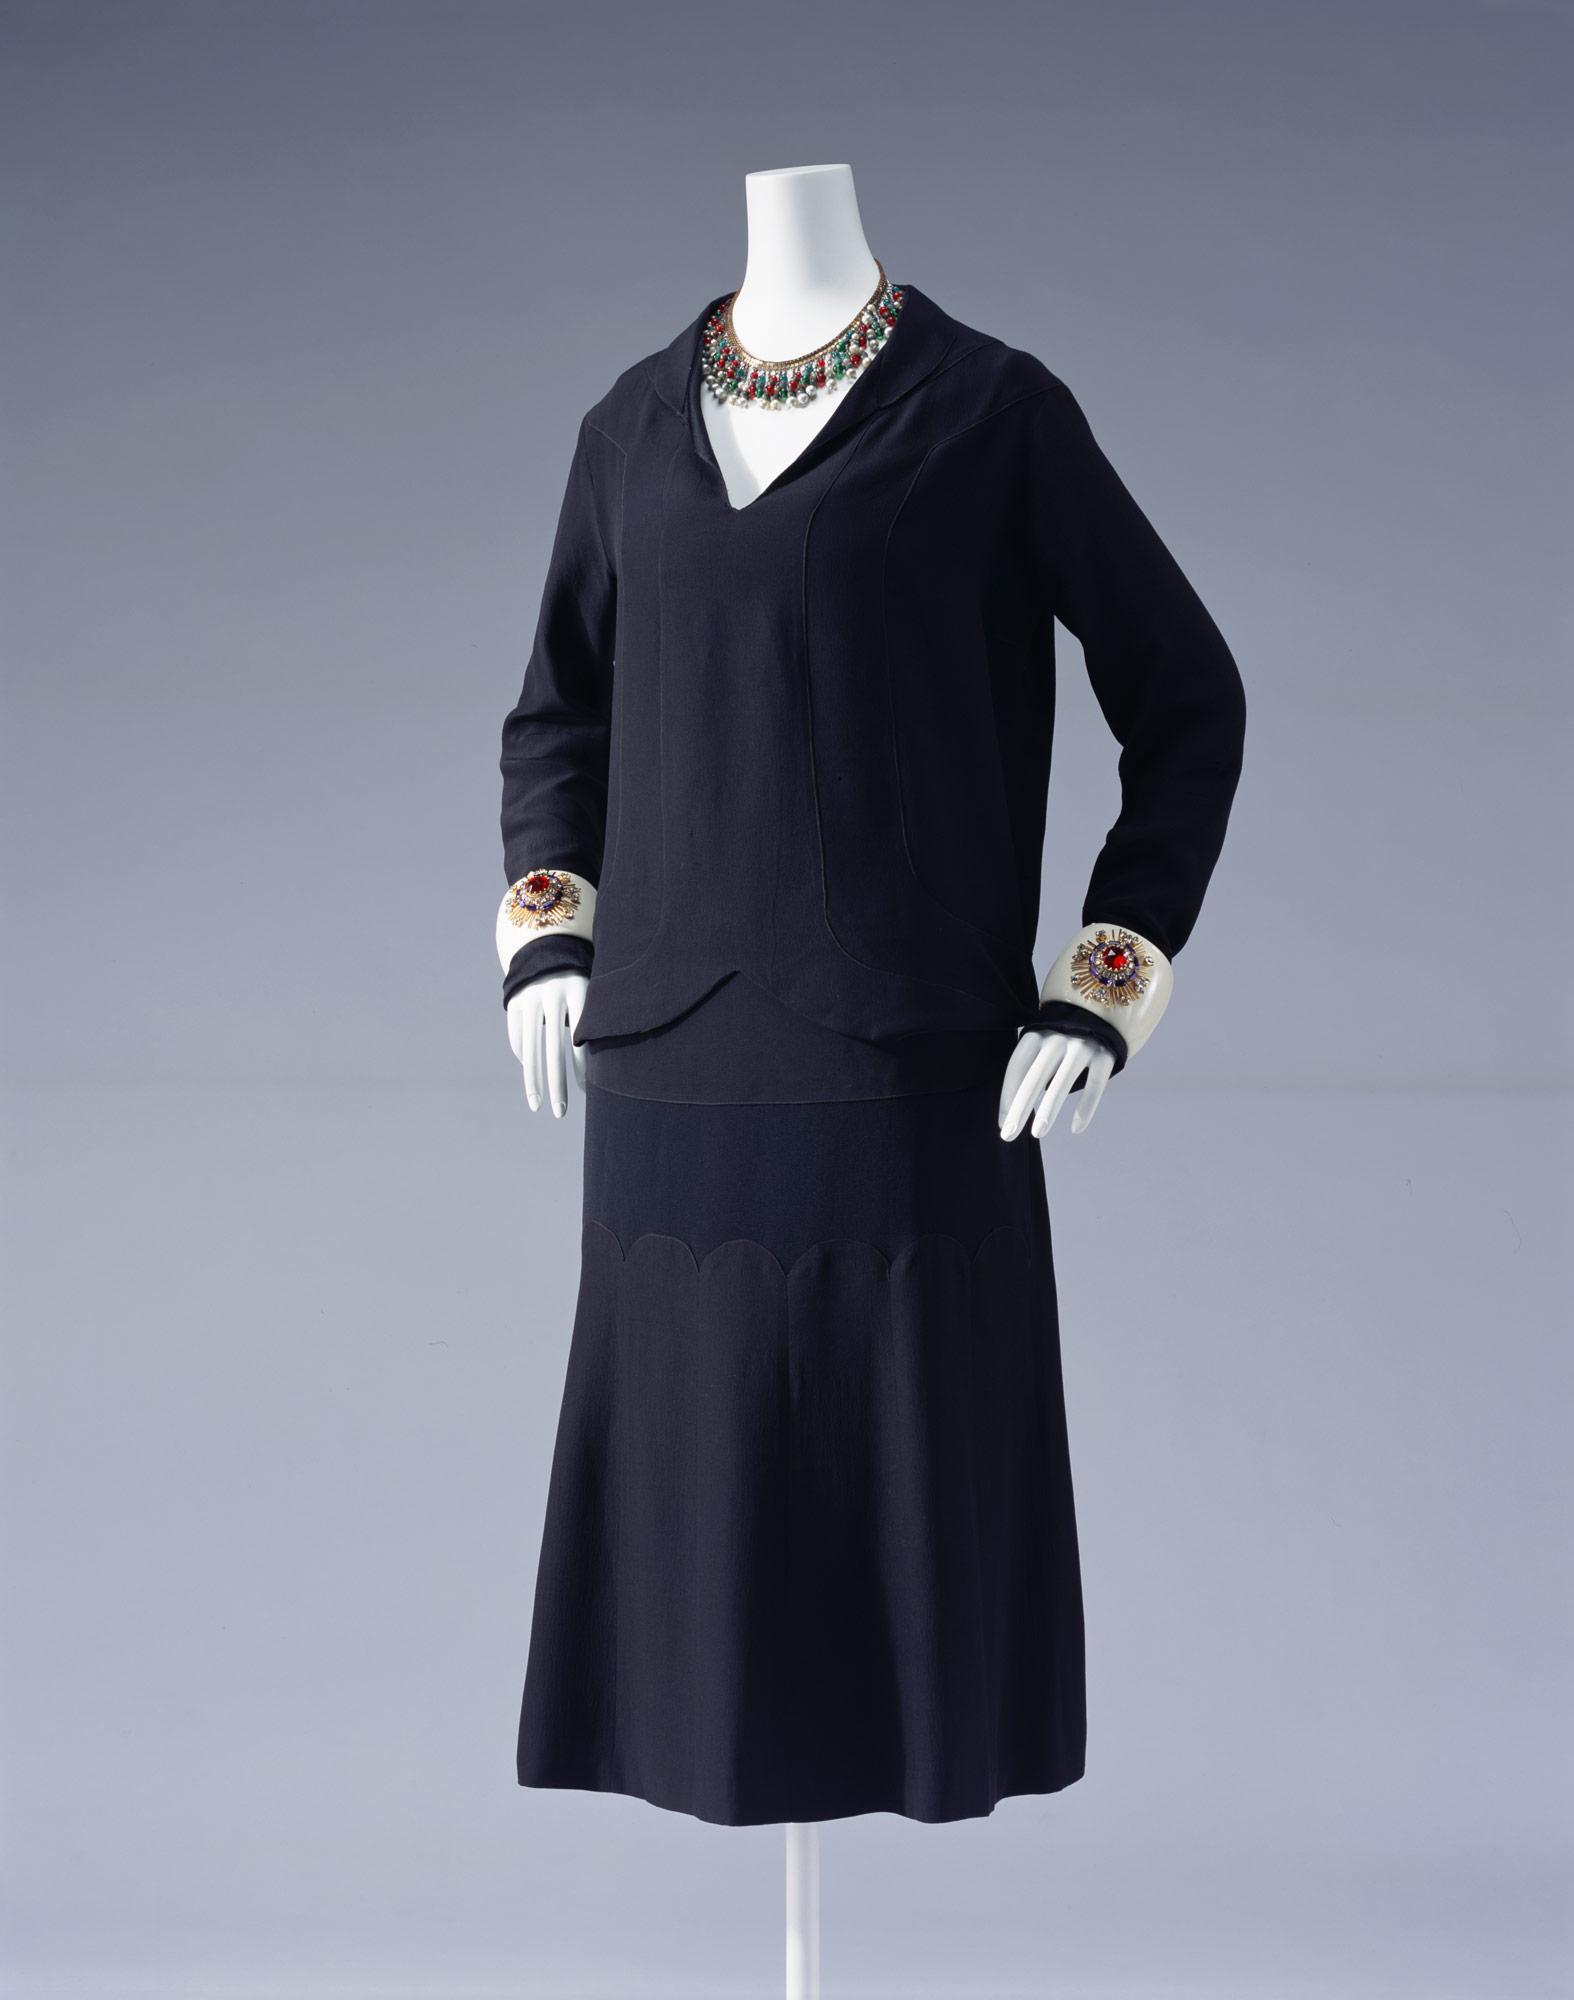 Габриэль Шанель, ок. 1927